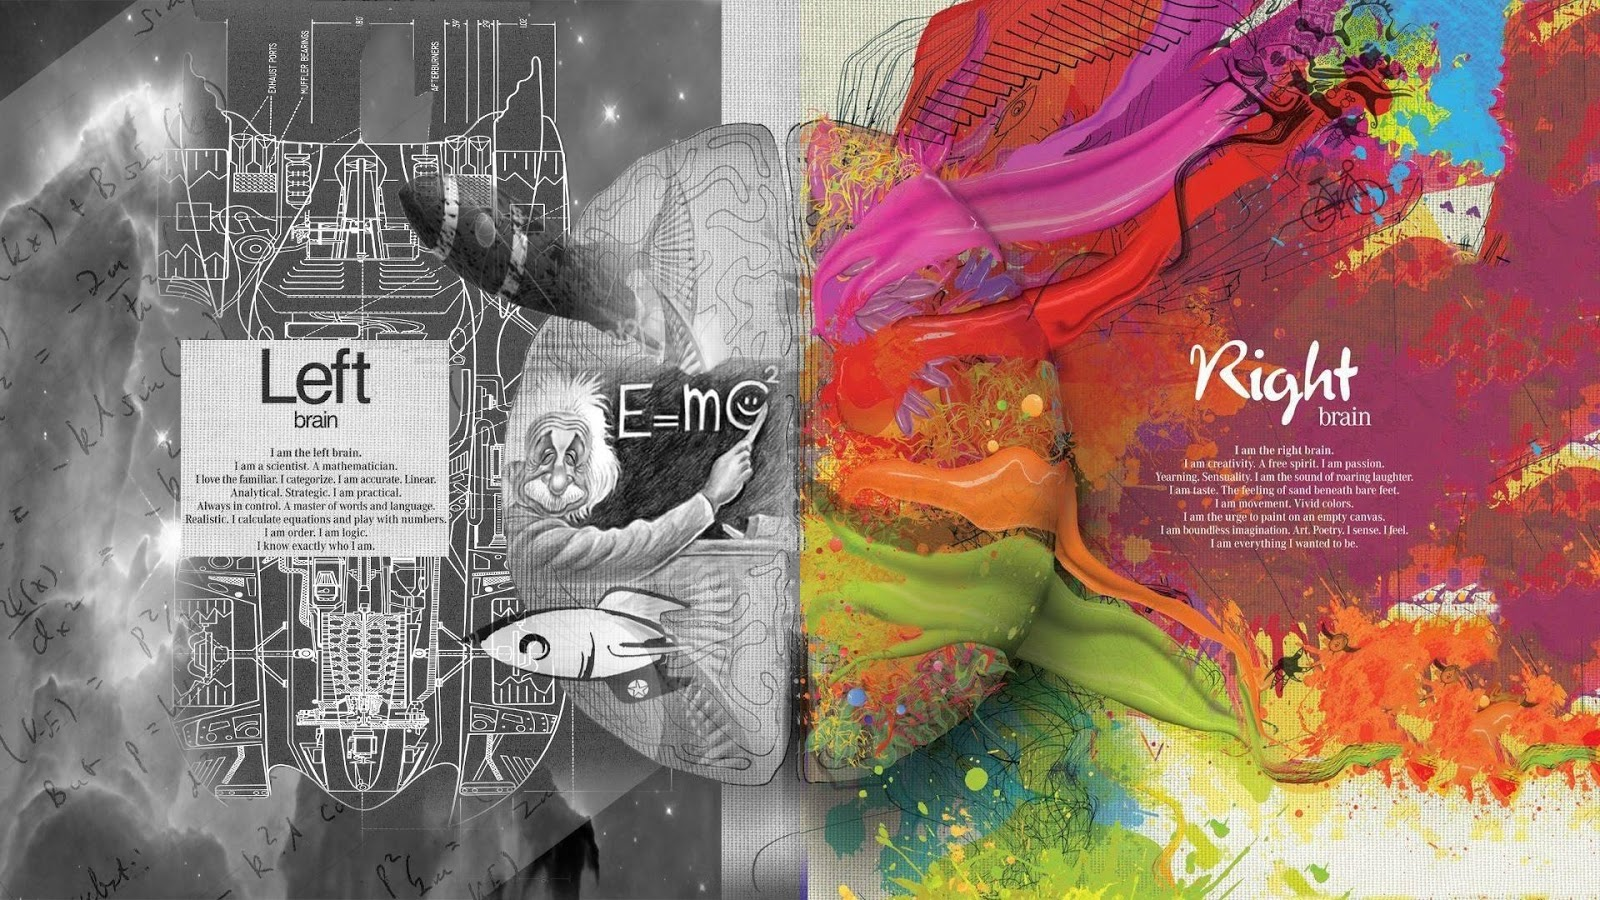 2014-08-26-right_brain_left_brain-Left Brain Purity